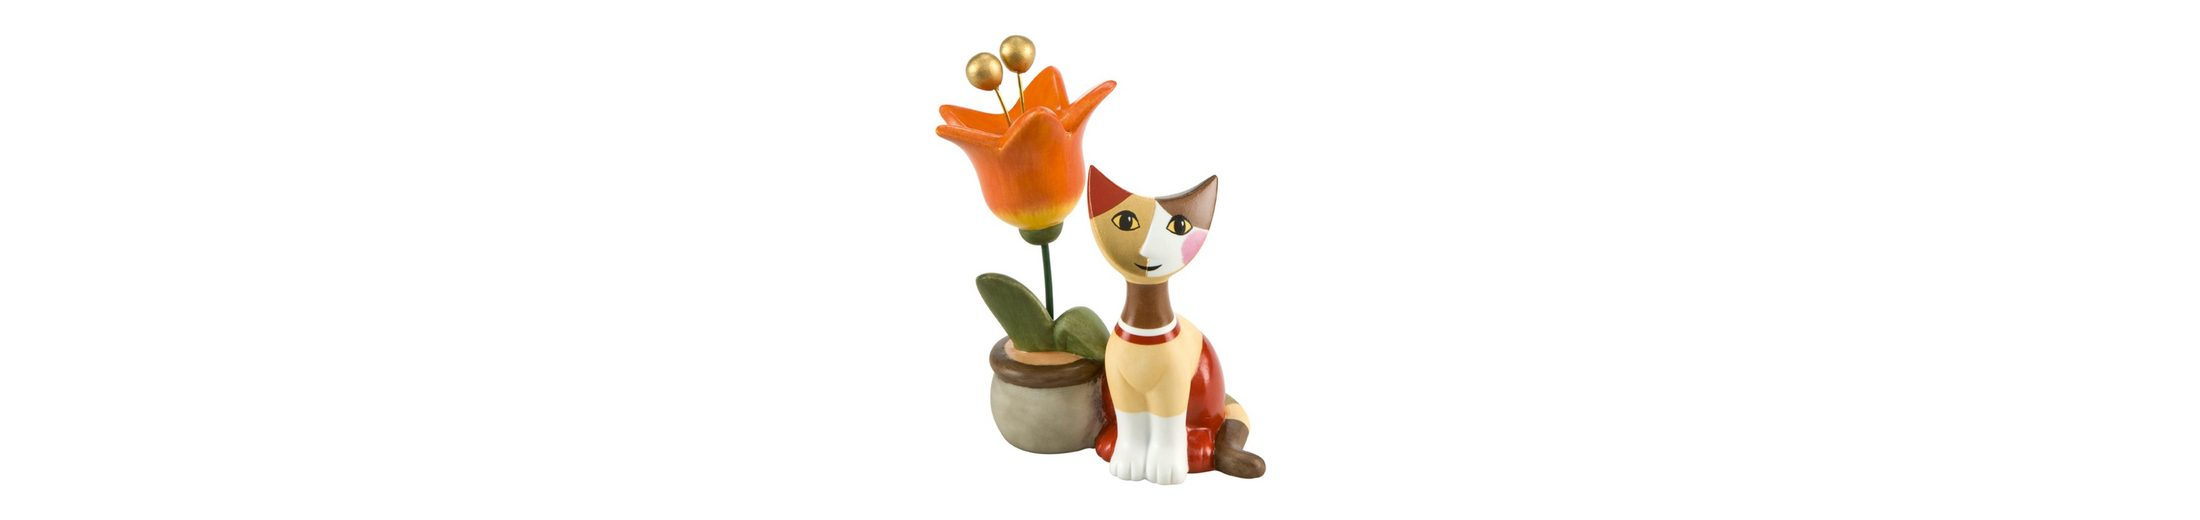 Goebel Greta con tulipano »Rosina Wachtmeister«